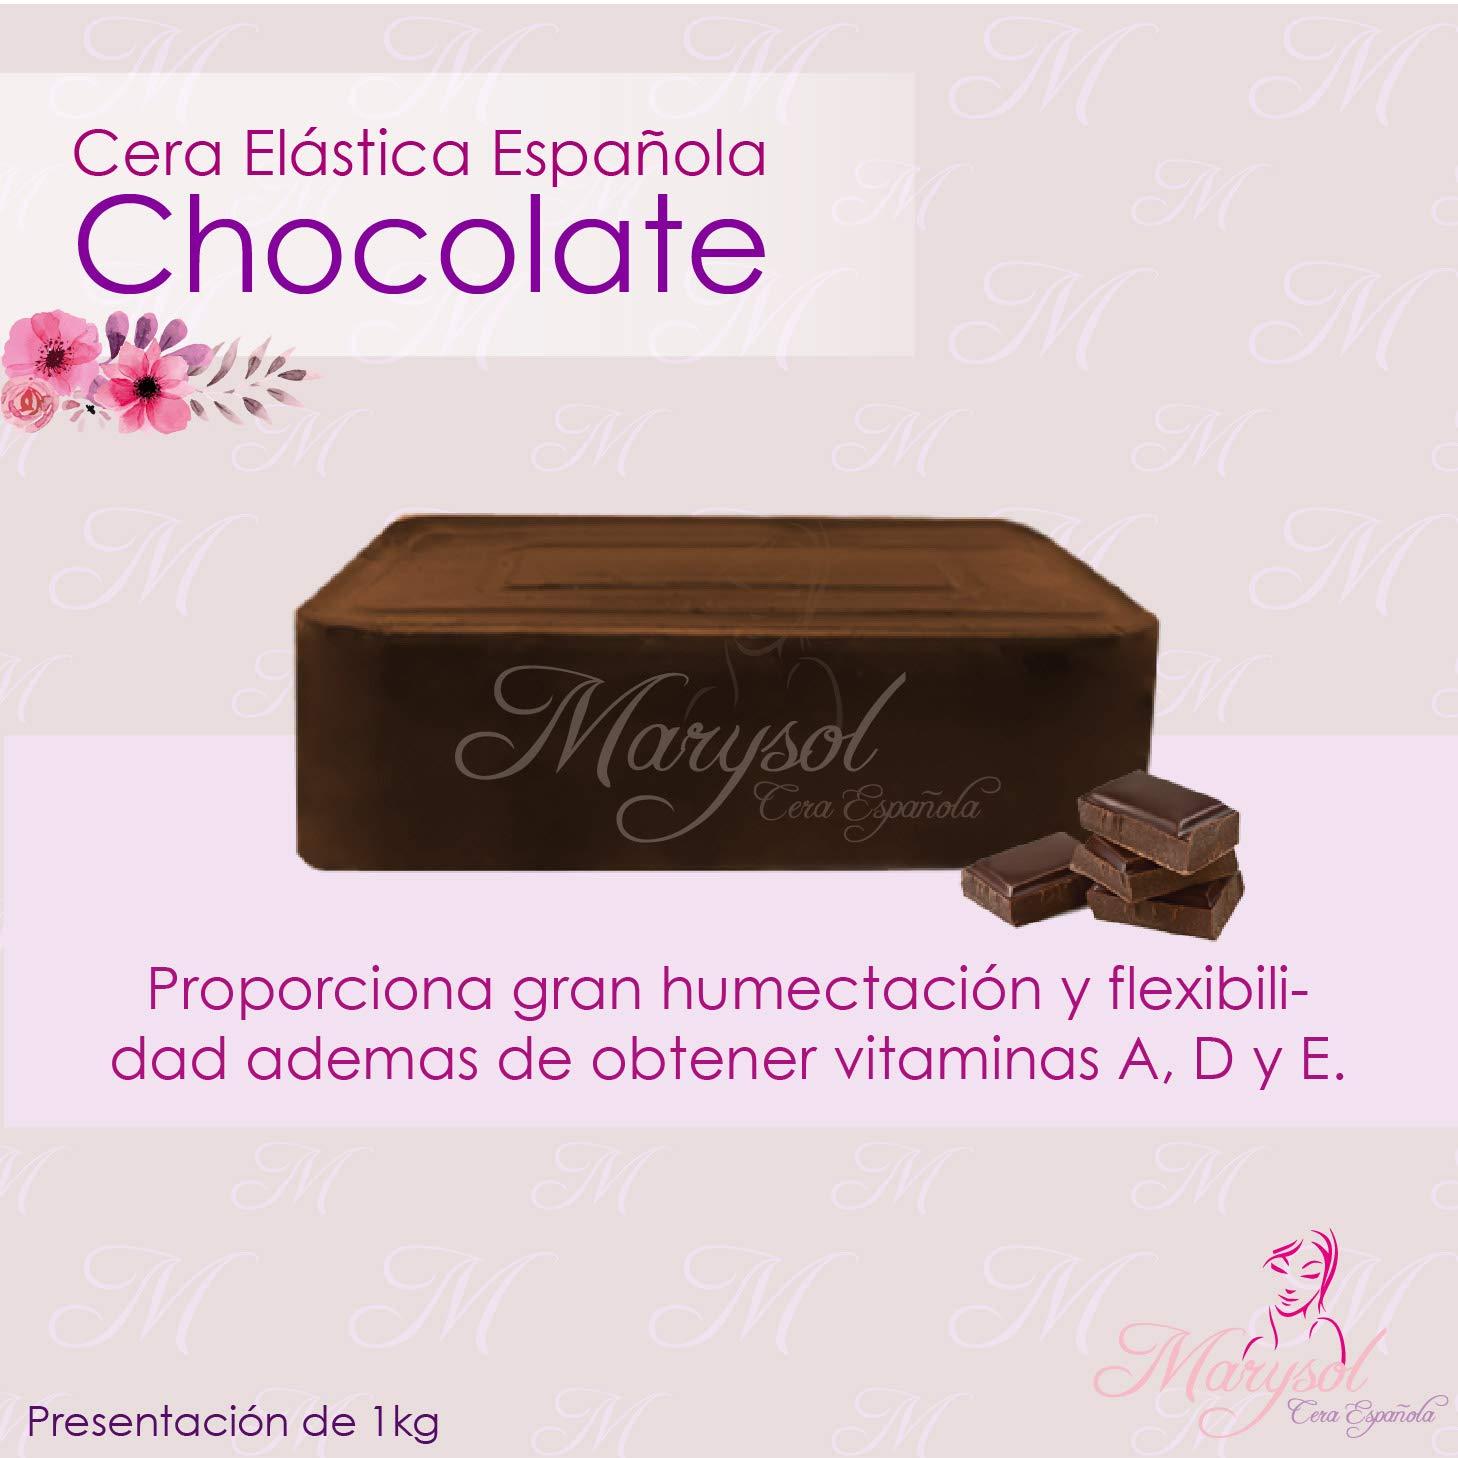 Cera Depiladora de Chocolate Española Elastica Marysol hard wax Depilacion sin Bandas No-Strip Disposable Wax Salon Spa estetica Vello Corporal Facial Bikini Epilacion Epilatoria